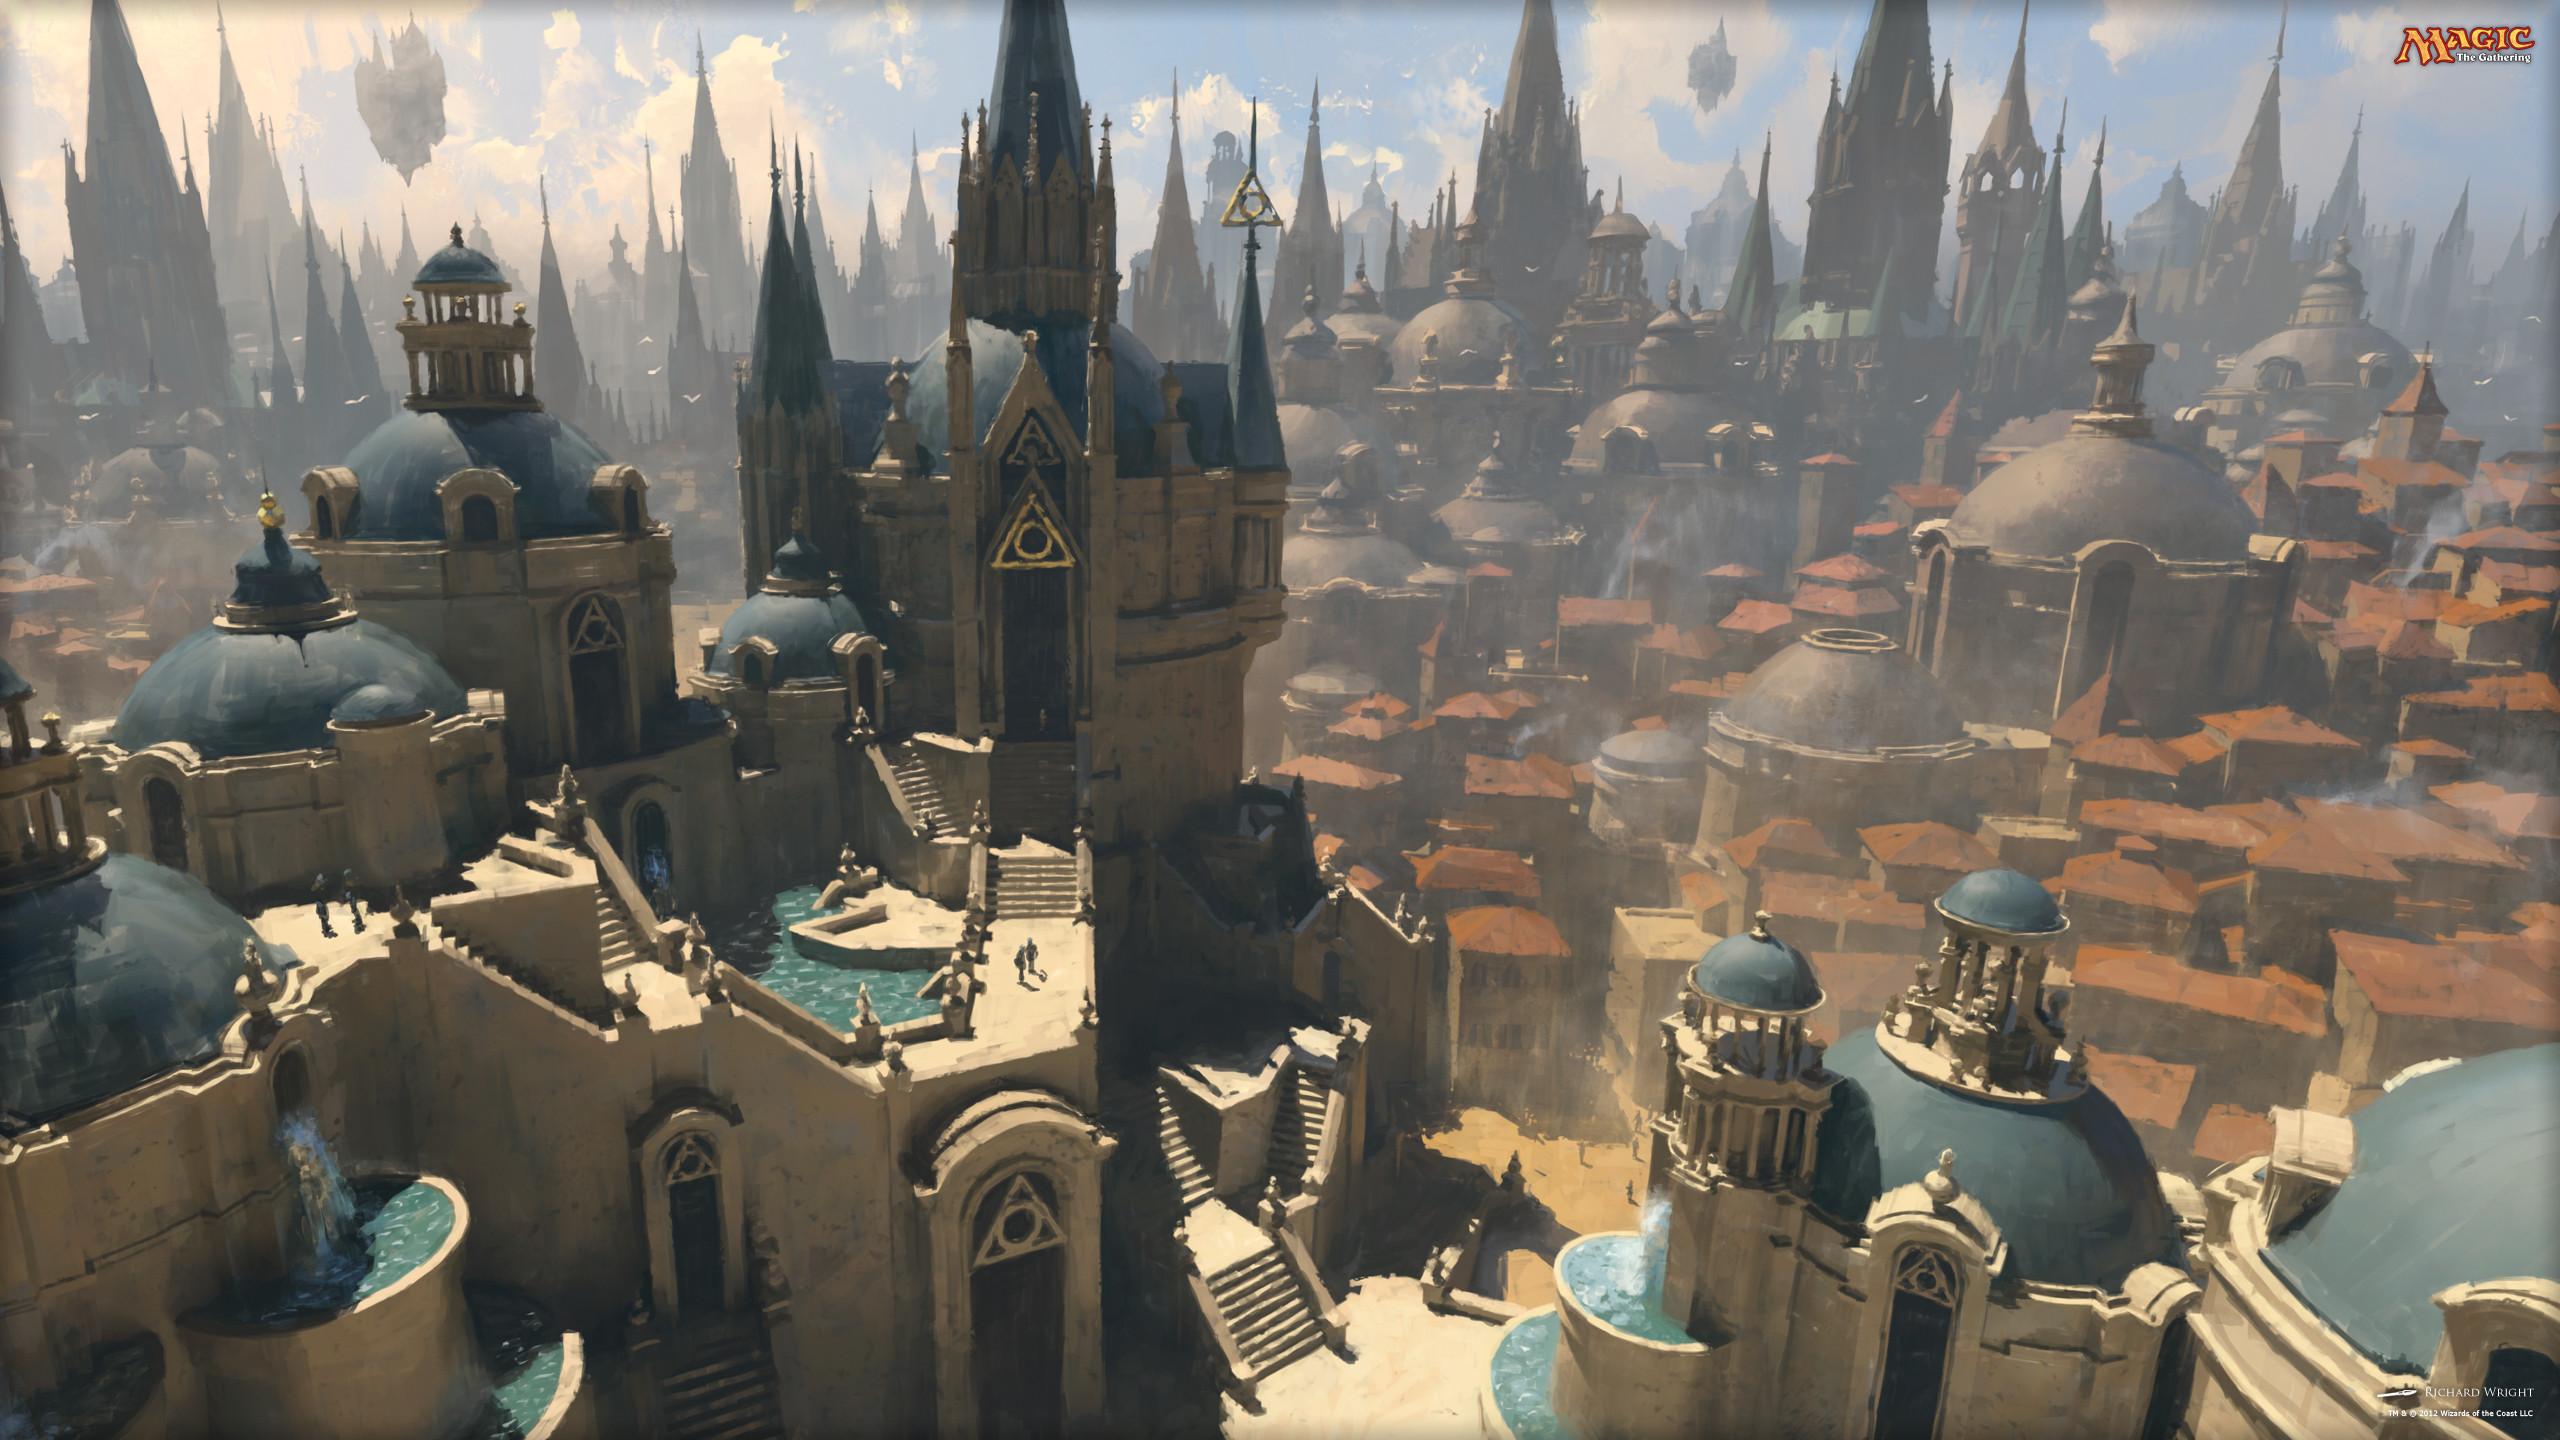 fantasy art artwork magic gathering dark city cities   Arquitectura Elfica    Pinterest   Dark city, Fantasy art and Artwork